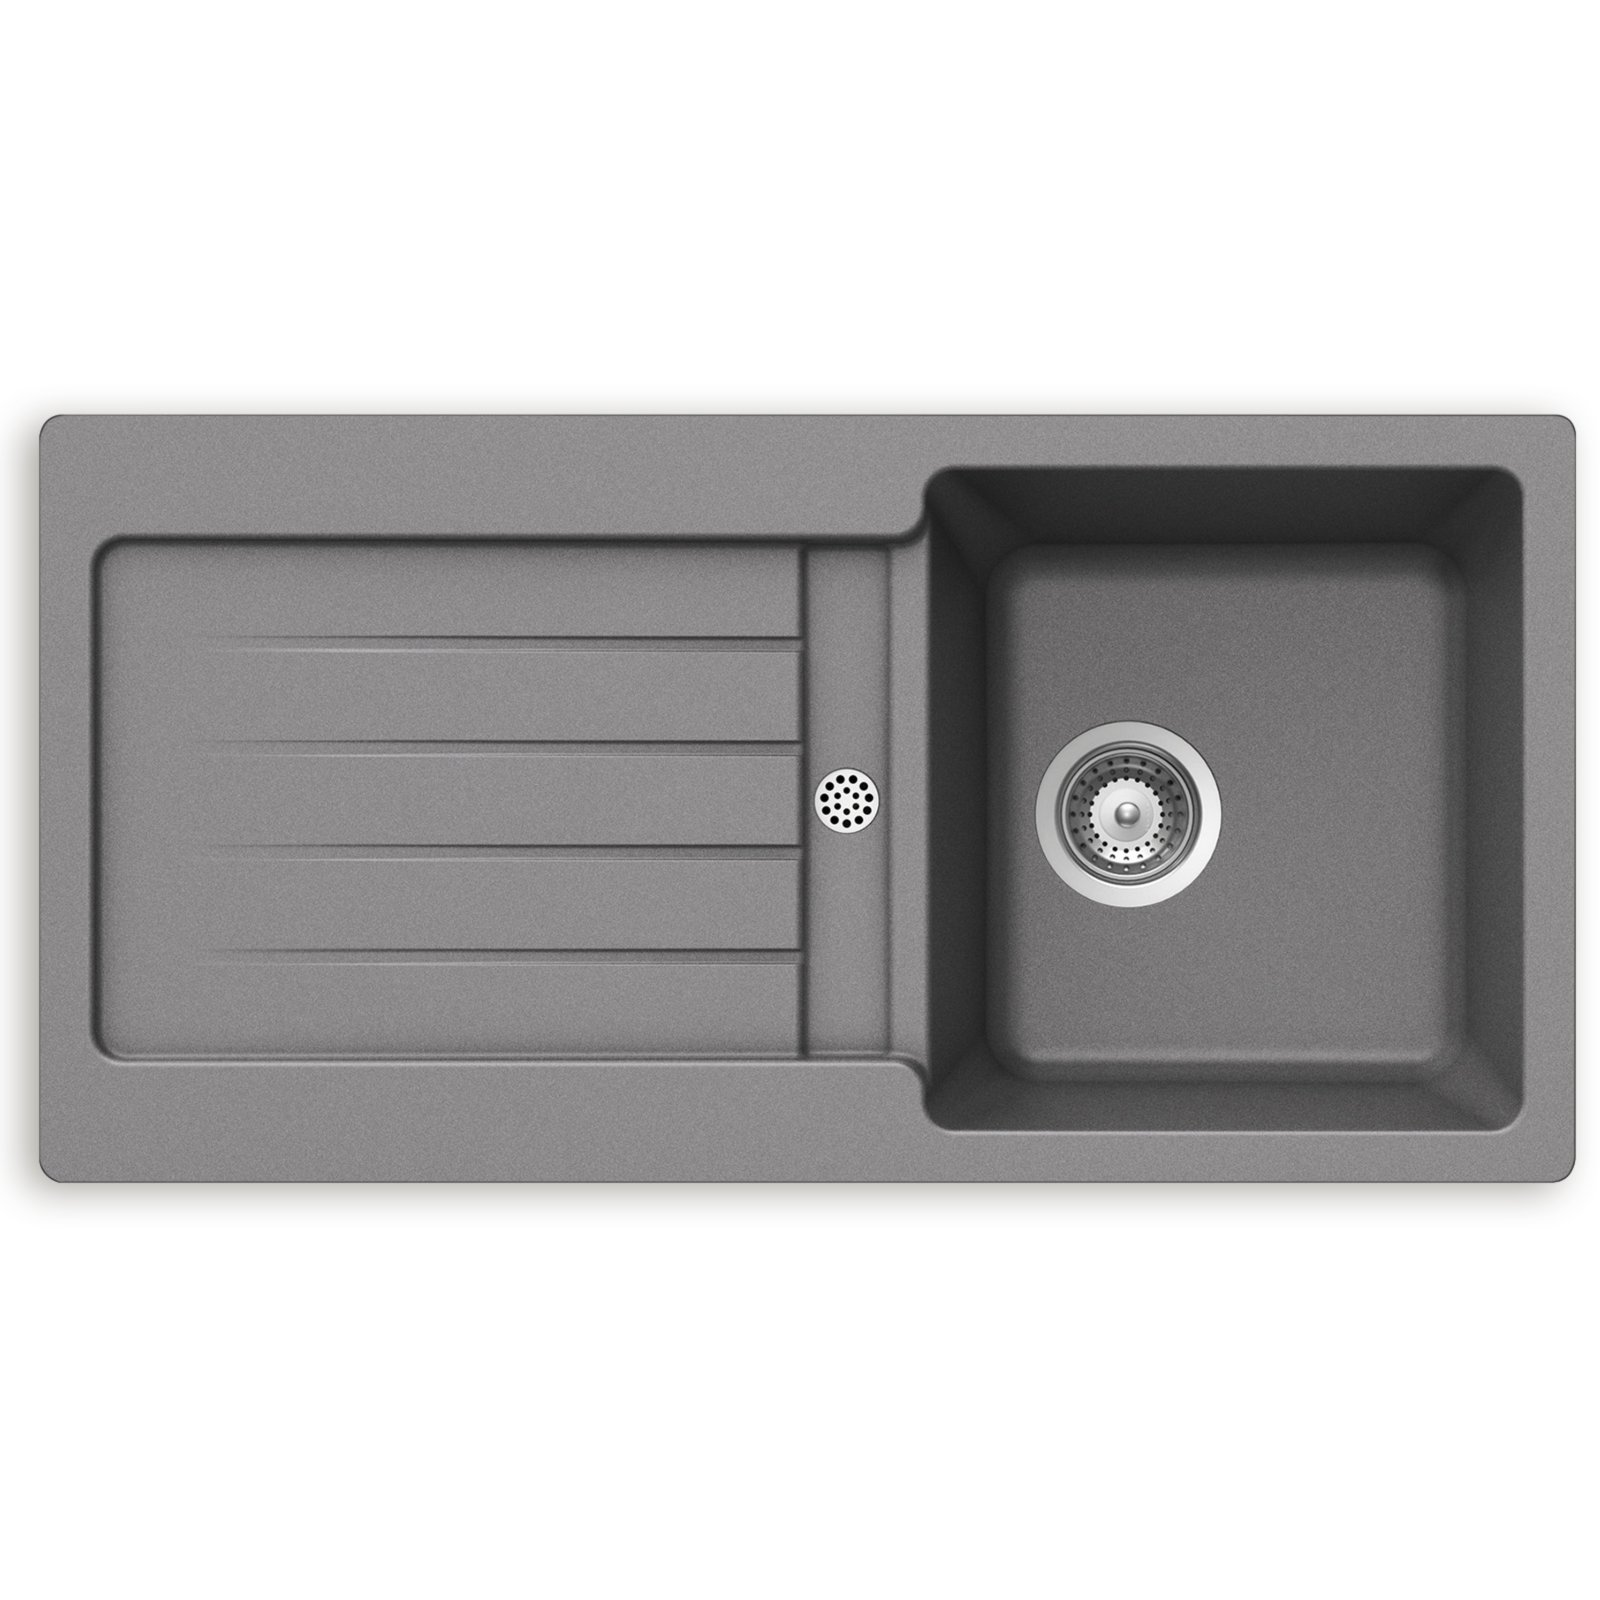 granit einbausp le zako grau unterschr nke ab 45 cm. Black Bedroom Furniture Sets. Home Design Ideas